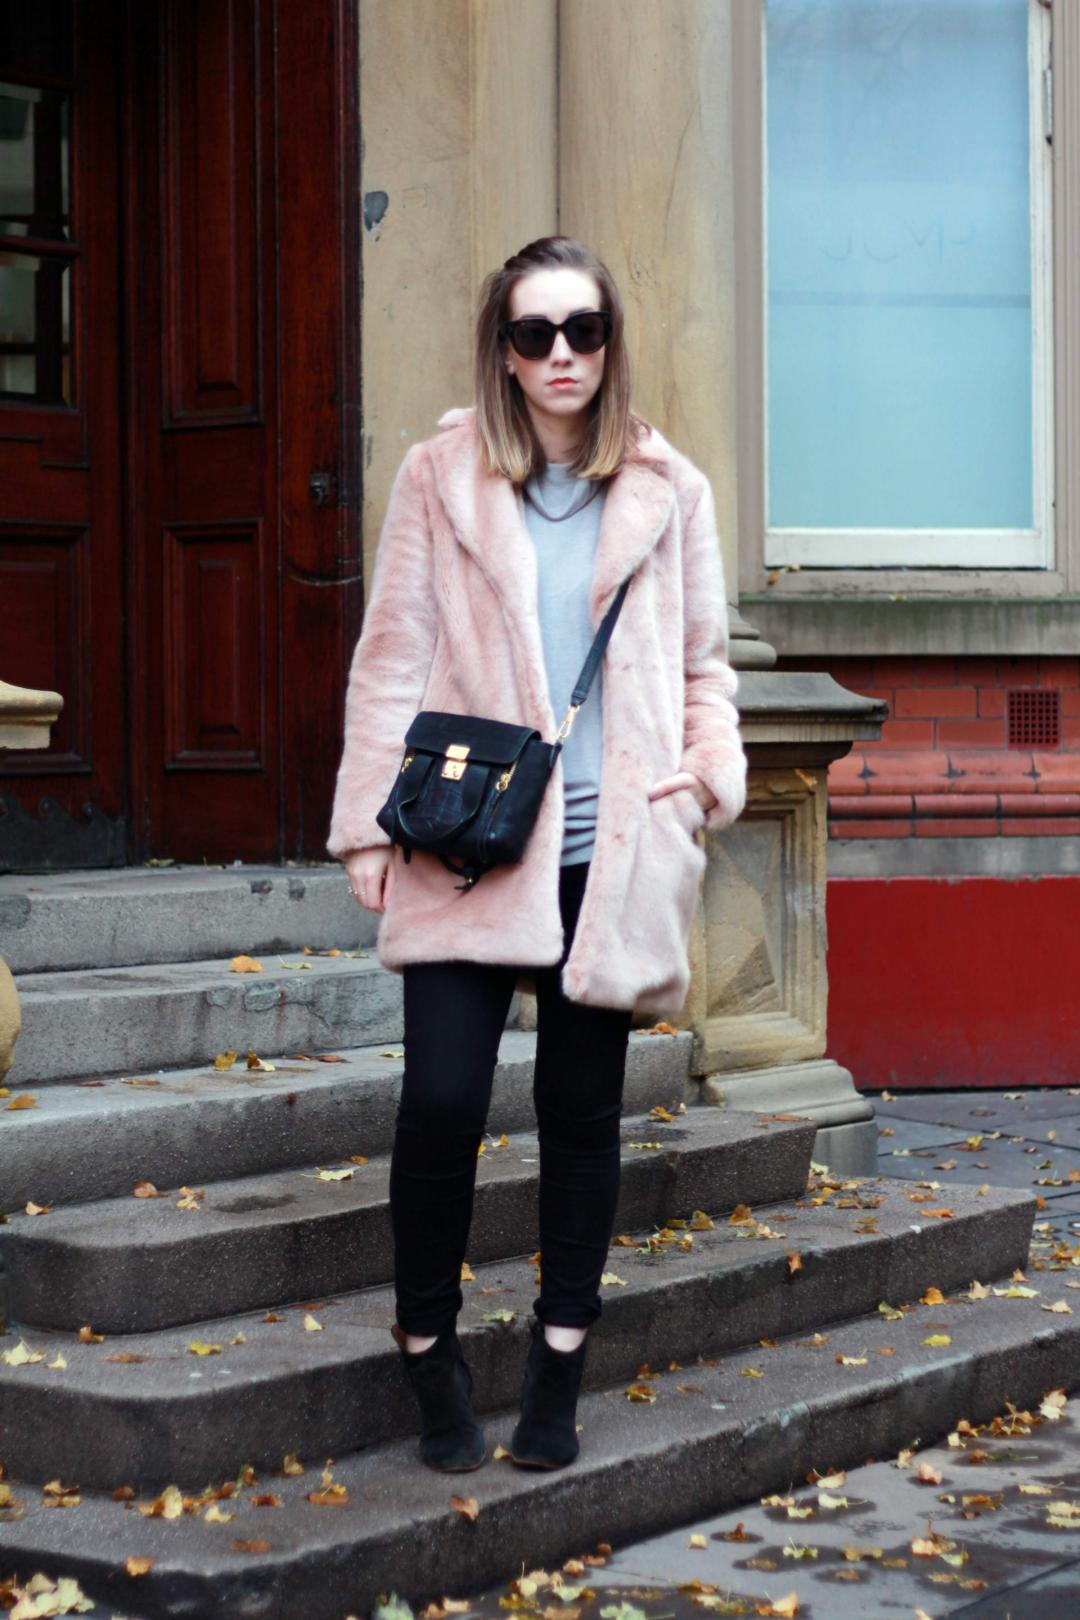 reiss-alba-pink-faux-fur-coat-phillip-lim-pashli-isabel-marant-dicker-boots-street-style